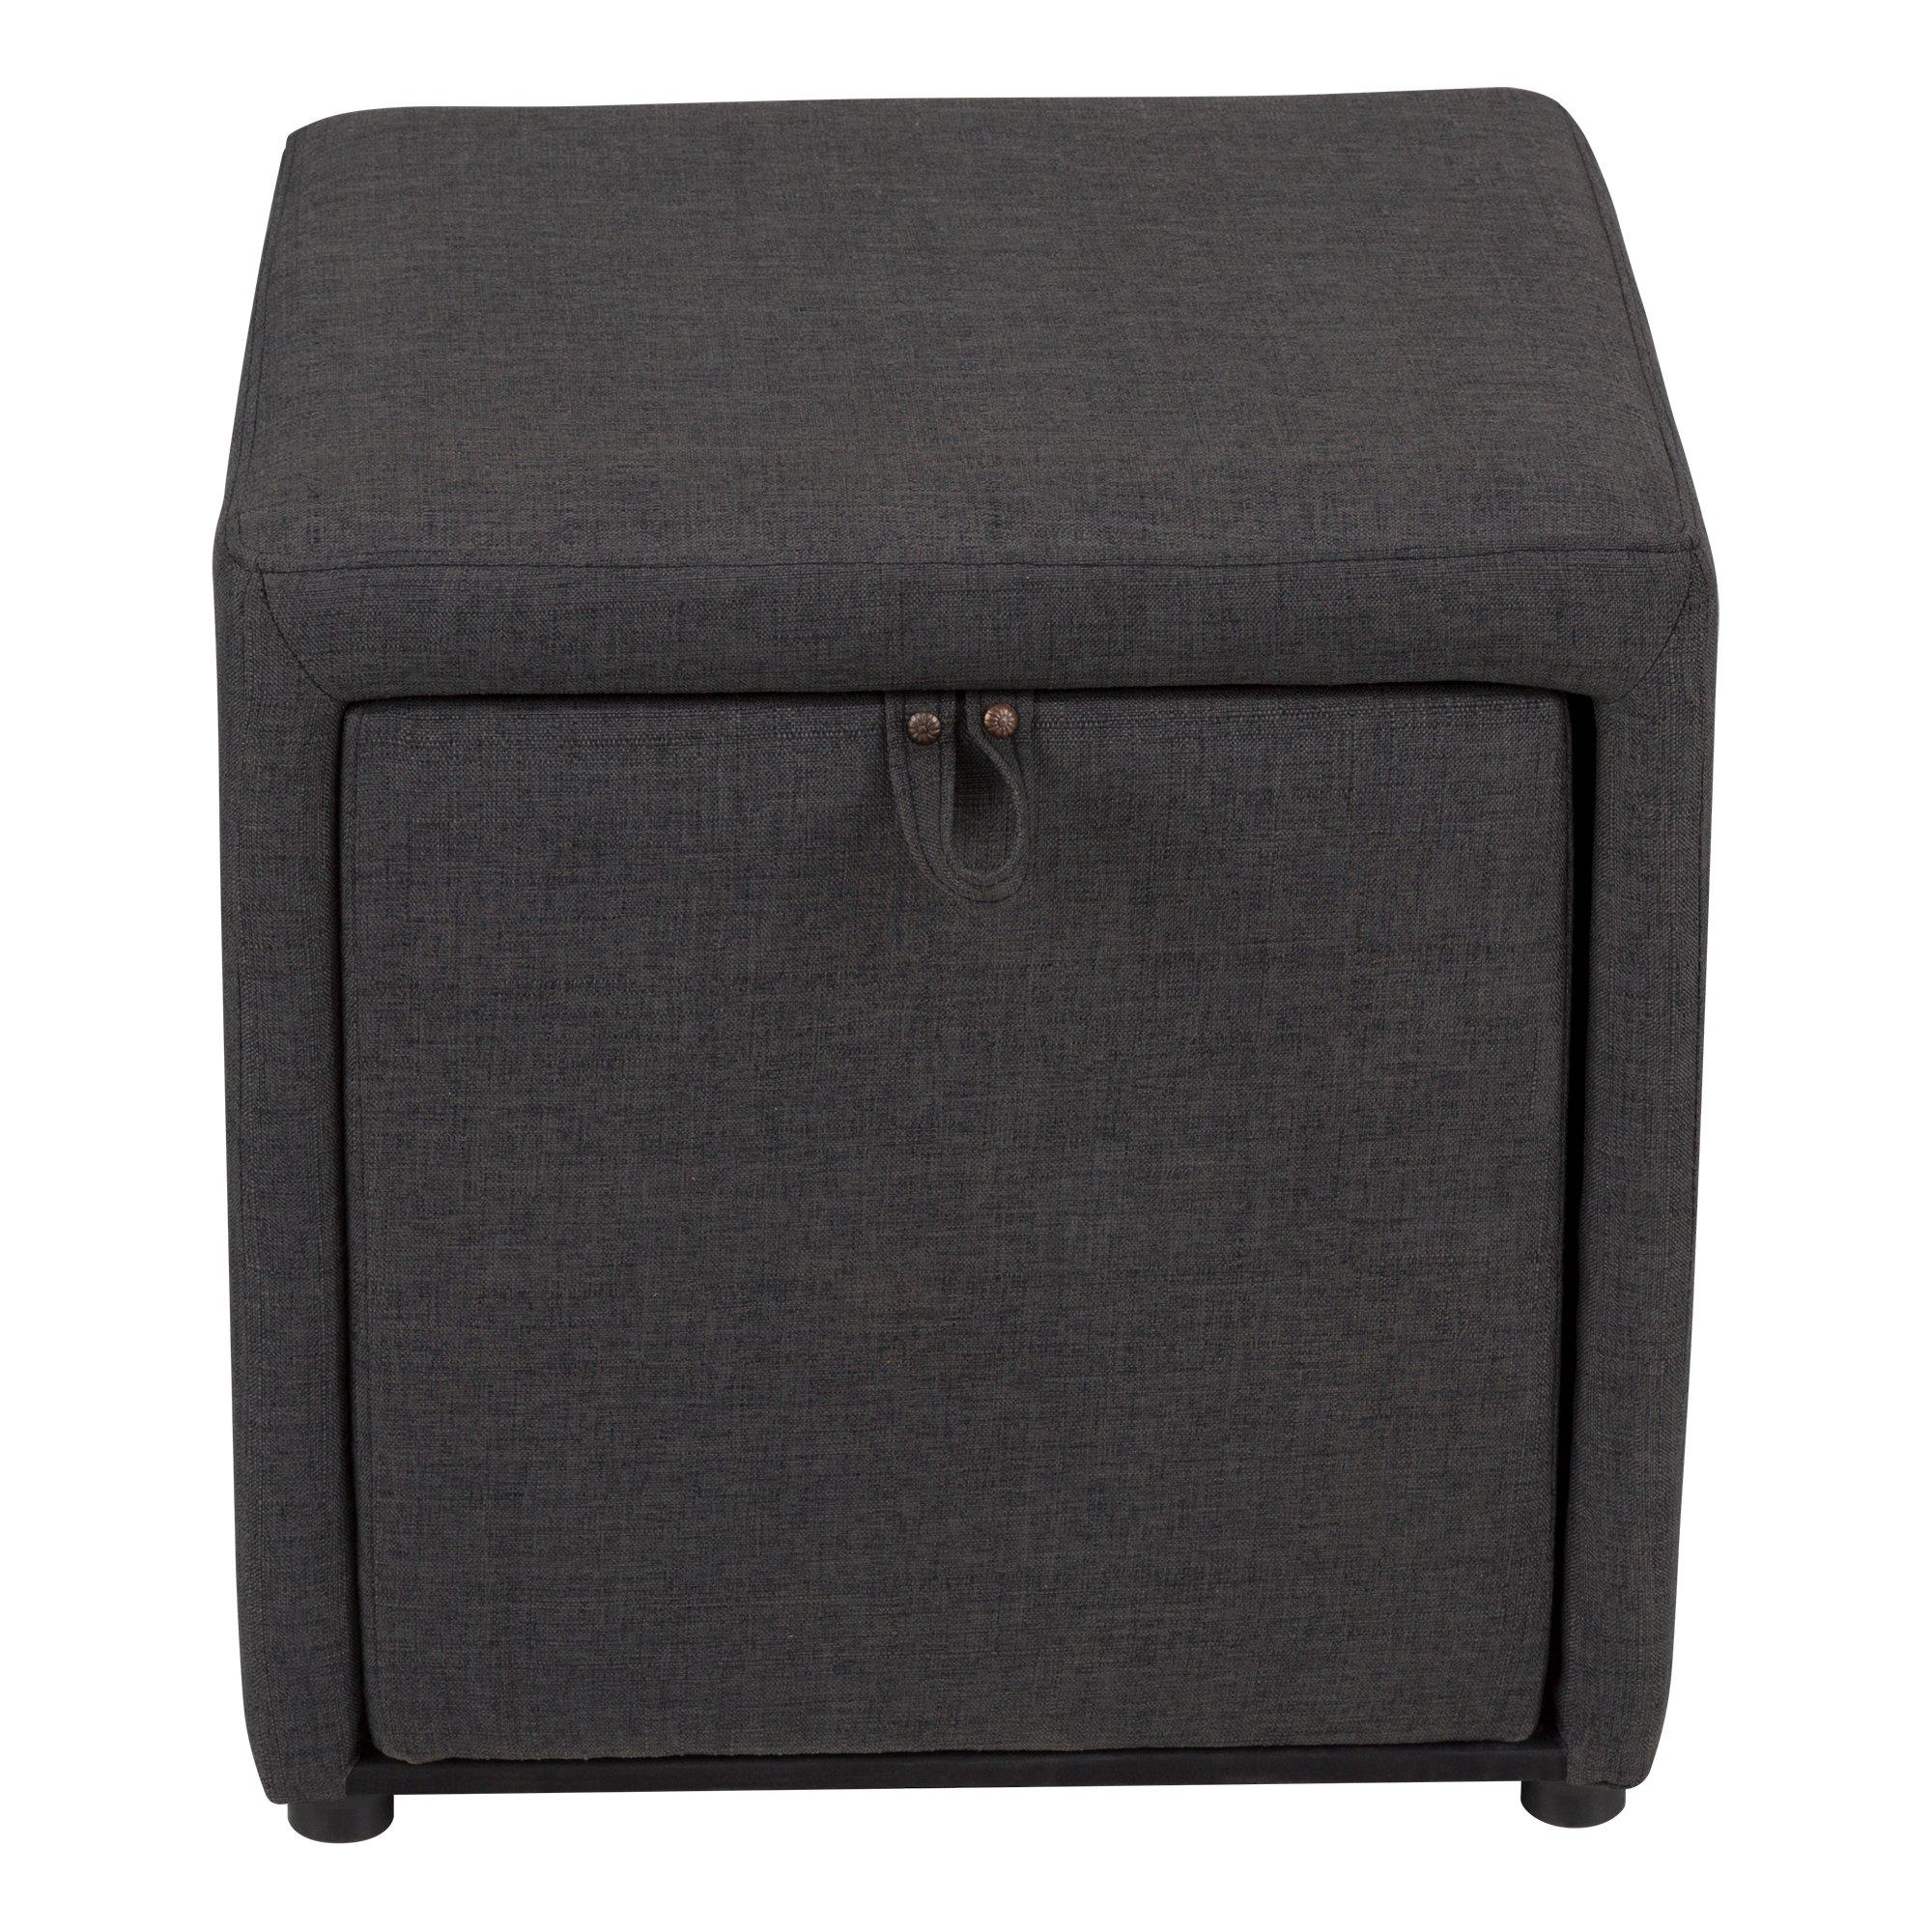 Fat Catalog Cube Storage Stool w/Drawer, Gray, ALT-OUG1001-SO by Fat Catalog (Image #4)